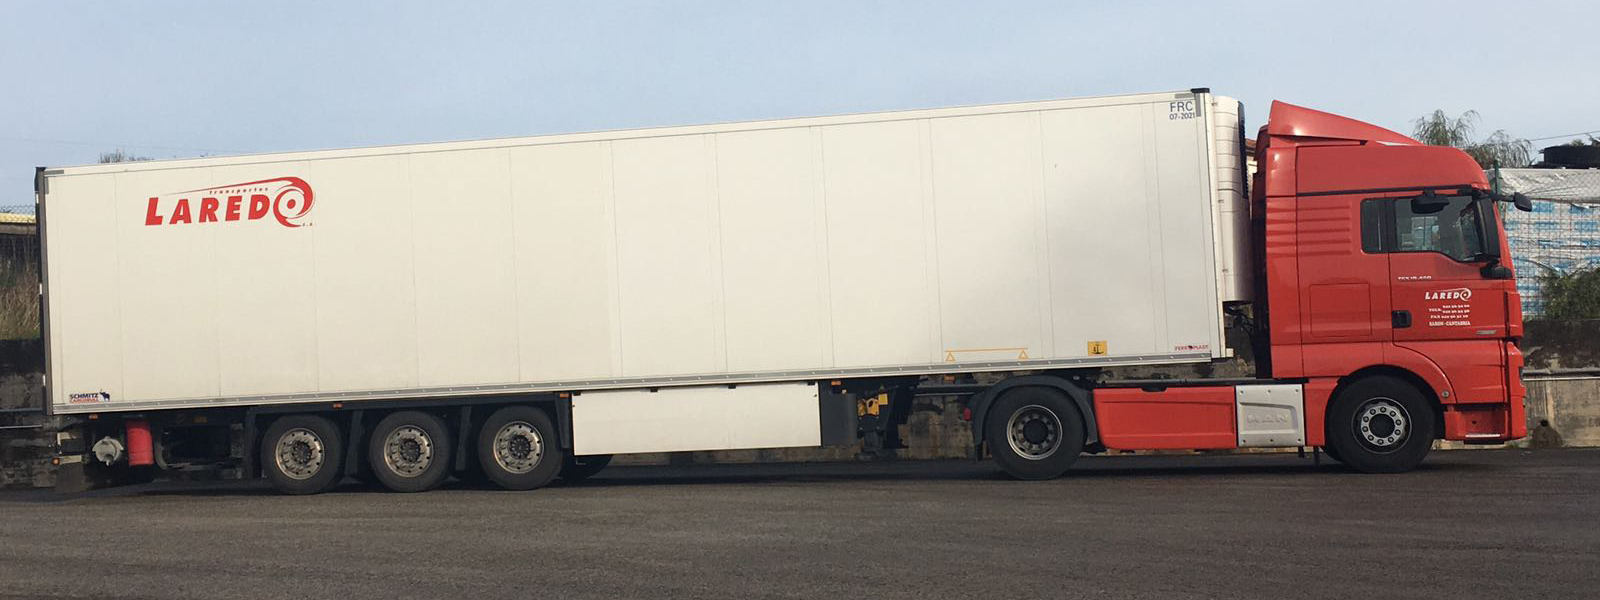 transportes laredo camion